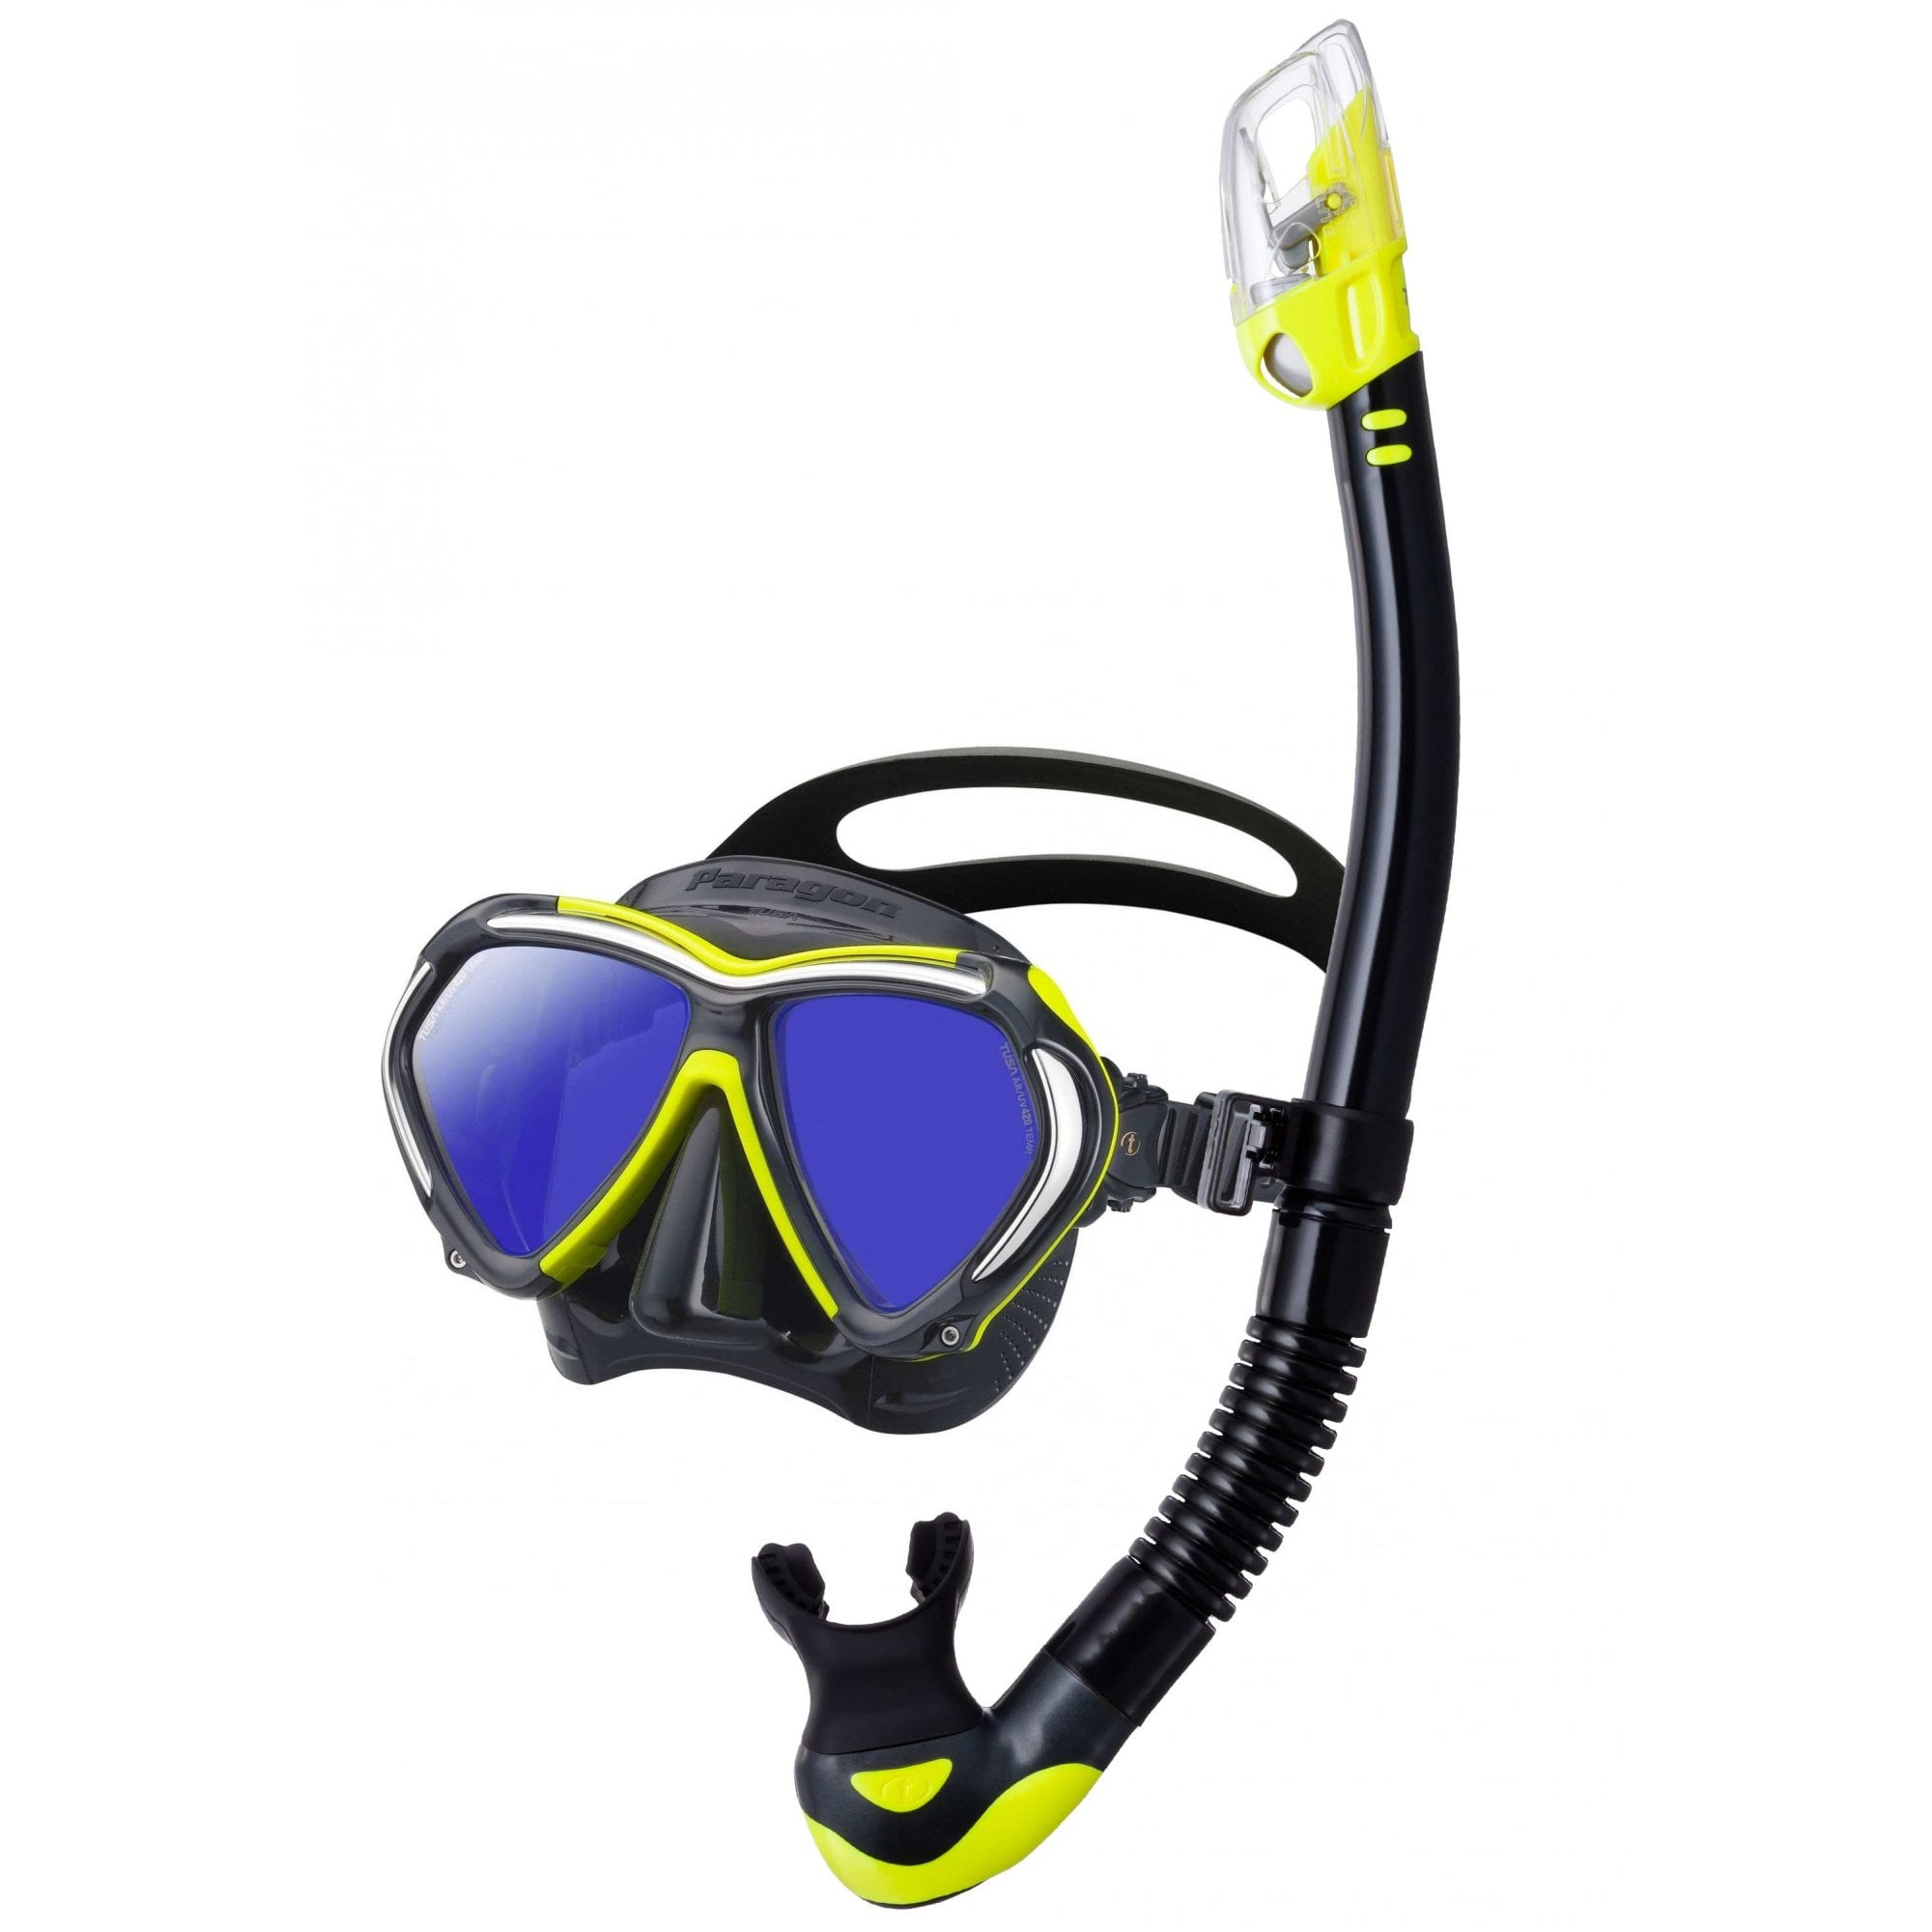 Tusa Hyper Dry Elite 2 SP-0101 Adult Dry Snorkel Indigo Blue